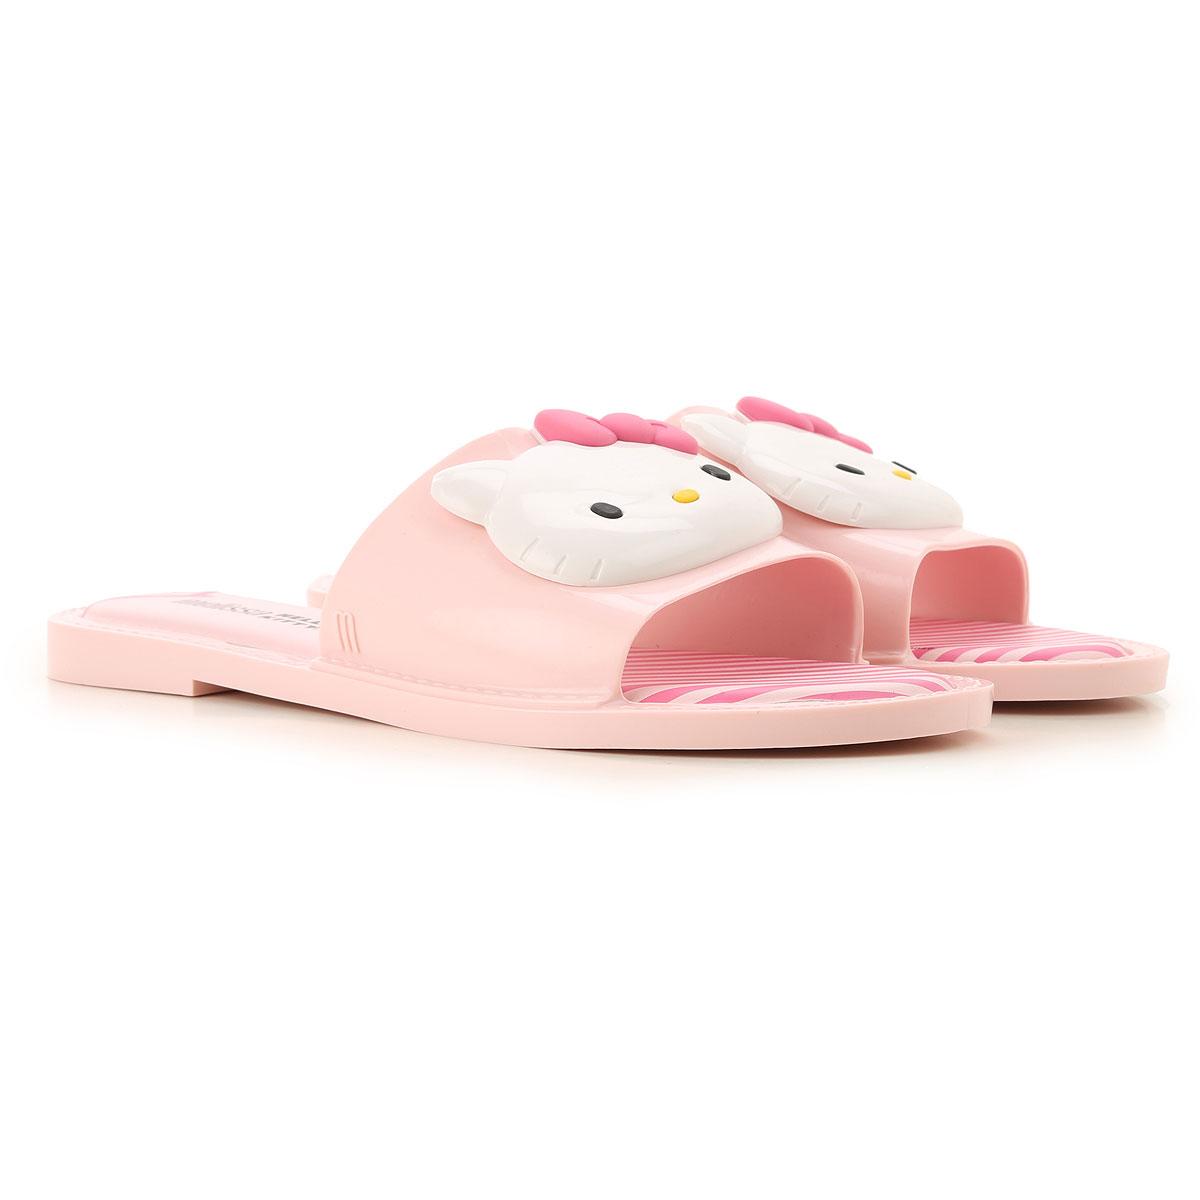 Melissa Sandals for Women On Sale, Melissa + Hello Kitty, Pink, PVC, 2019, USA 5 - EUR 35/36 USA 6 - EUR 37 USA 7 - EUR 38 USA 8 - EUR 39 USA 9 - EUR